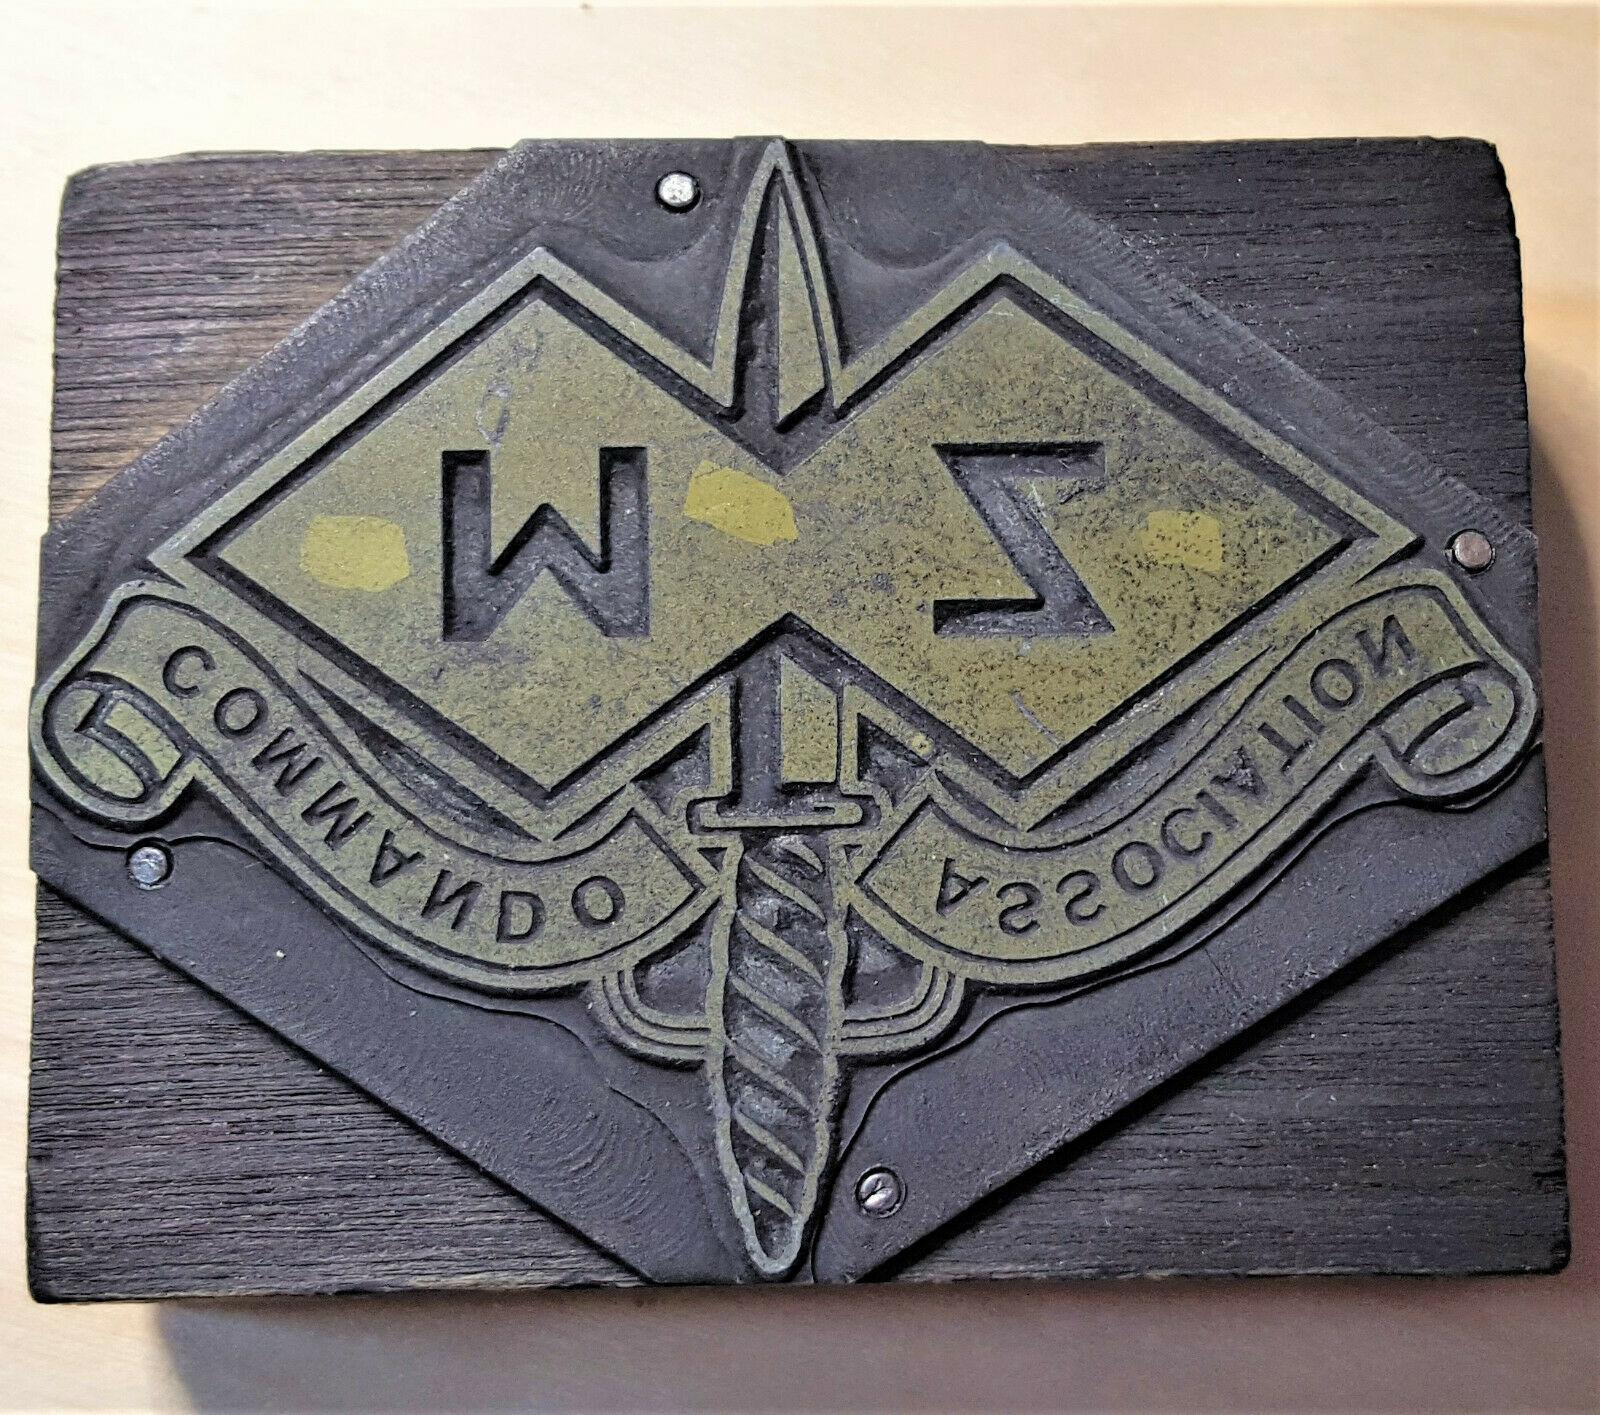 Vintage WW2 Australian Army M & Z Force ink block association stamp